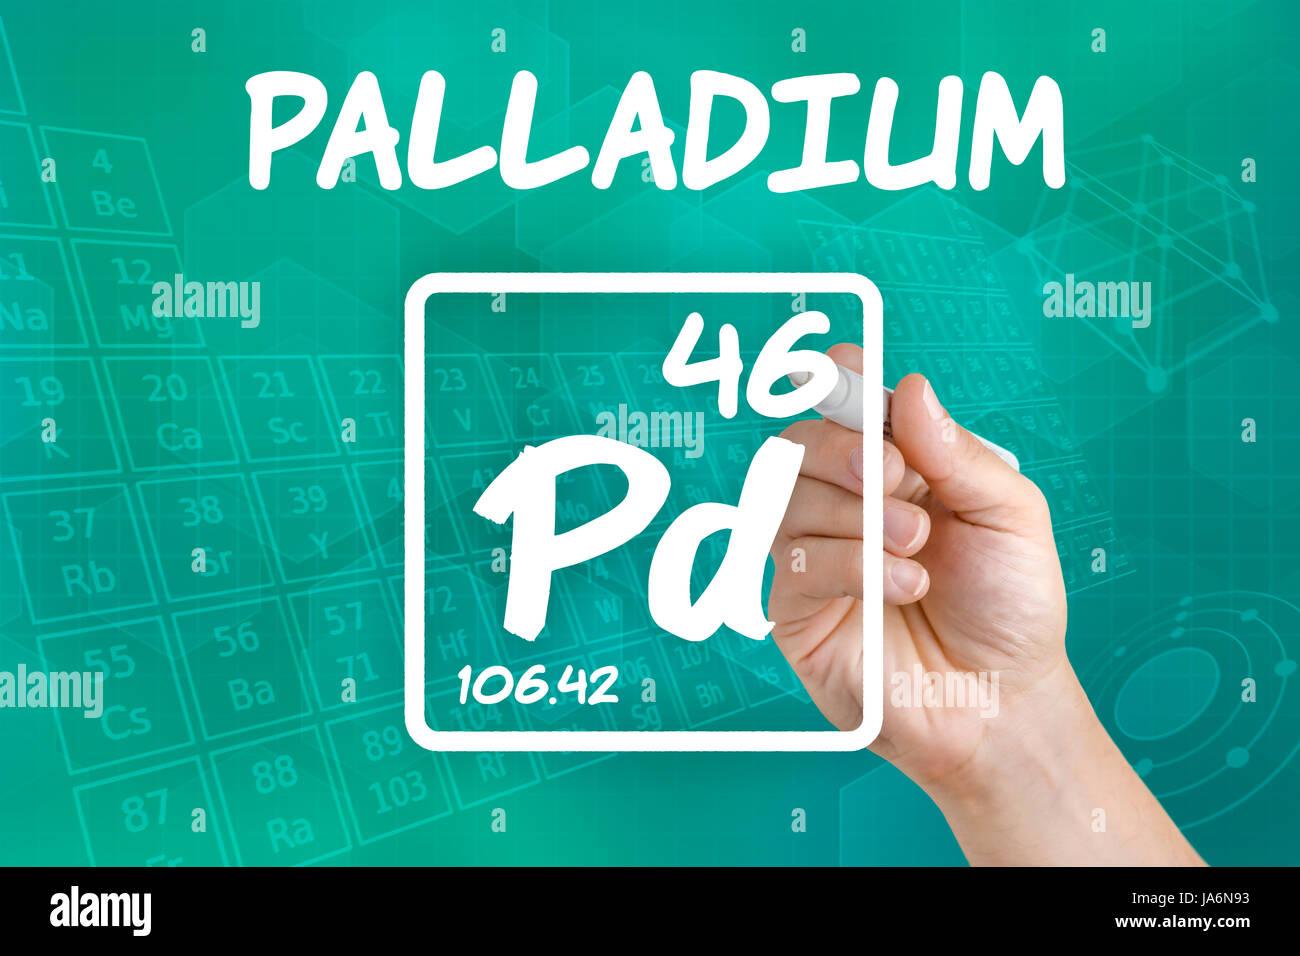 Palladium Chemical Element Stock Photos Palladium Chemical Element